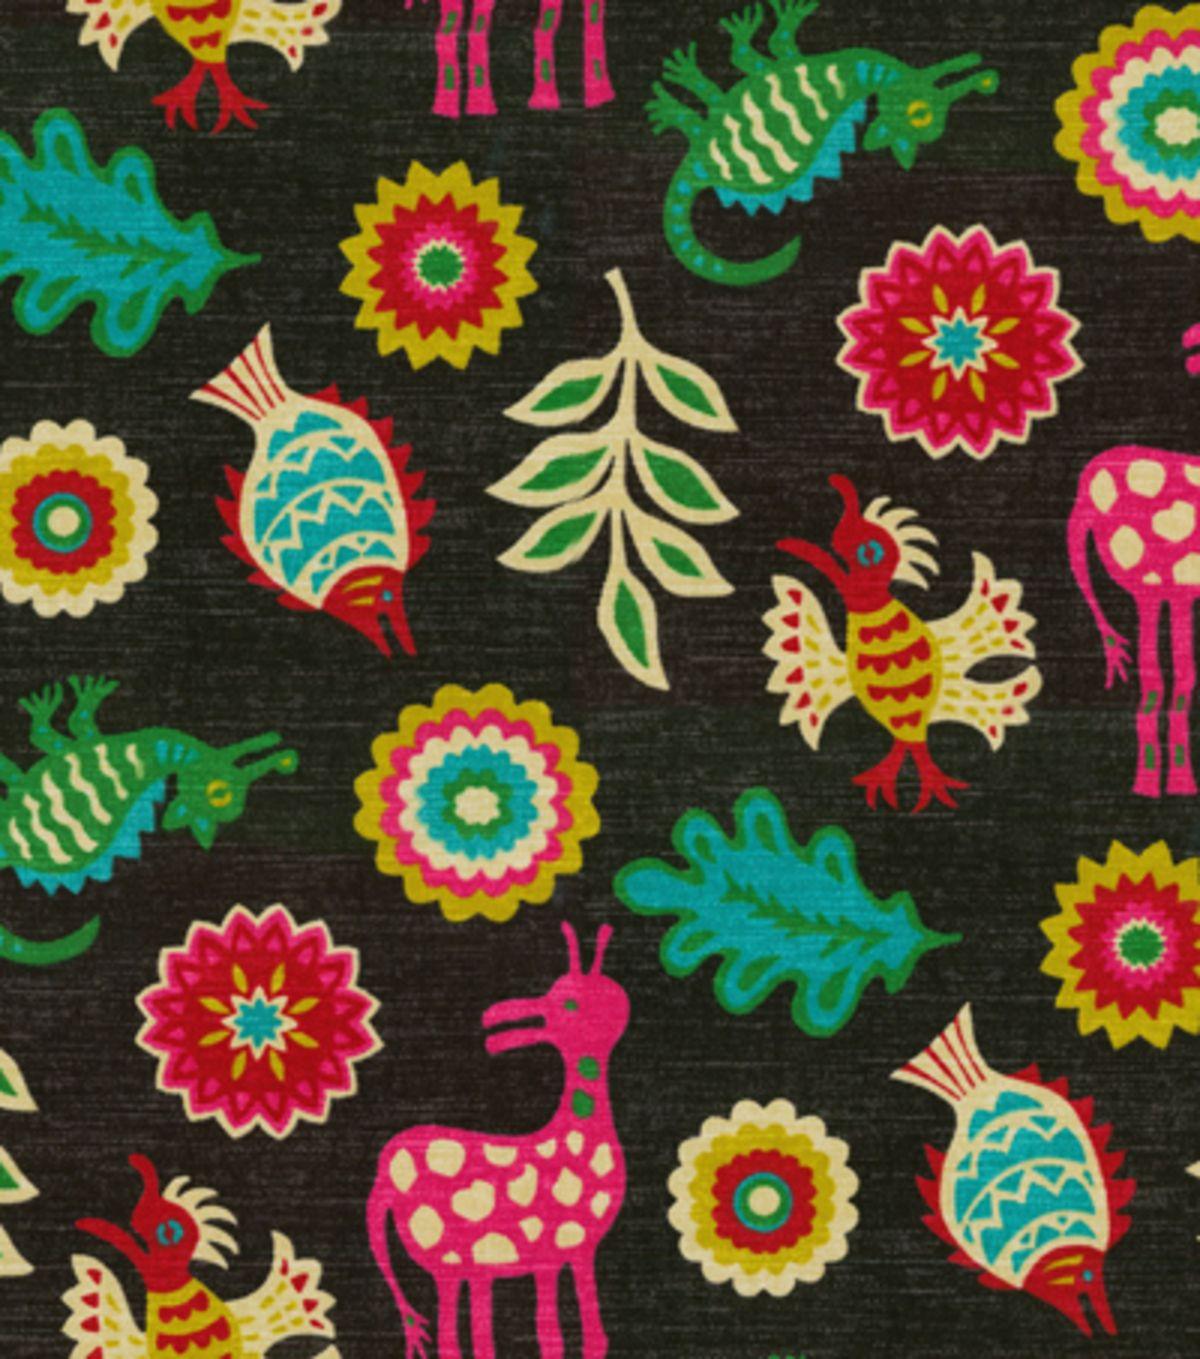 Home Decor Print Fabric-Waverly Mexicali Desert FlowerHome Decor Print Fabric-Waverly Mexicali Desert Flower,